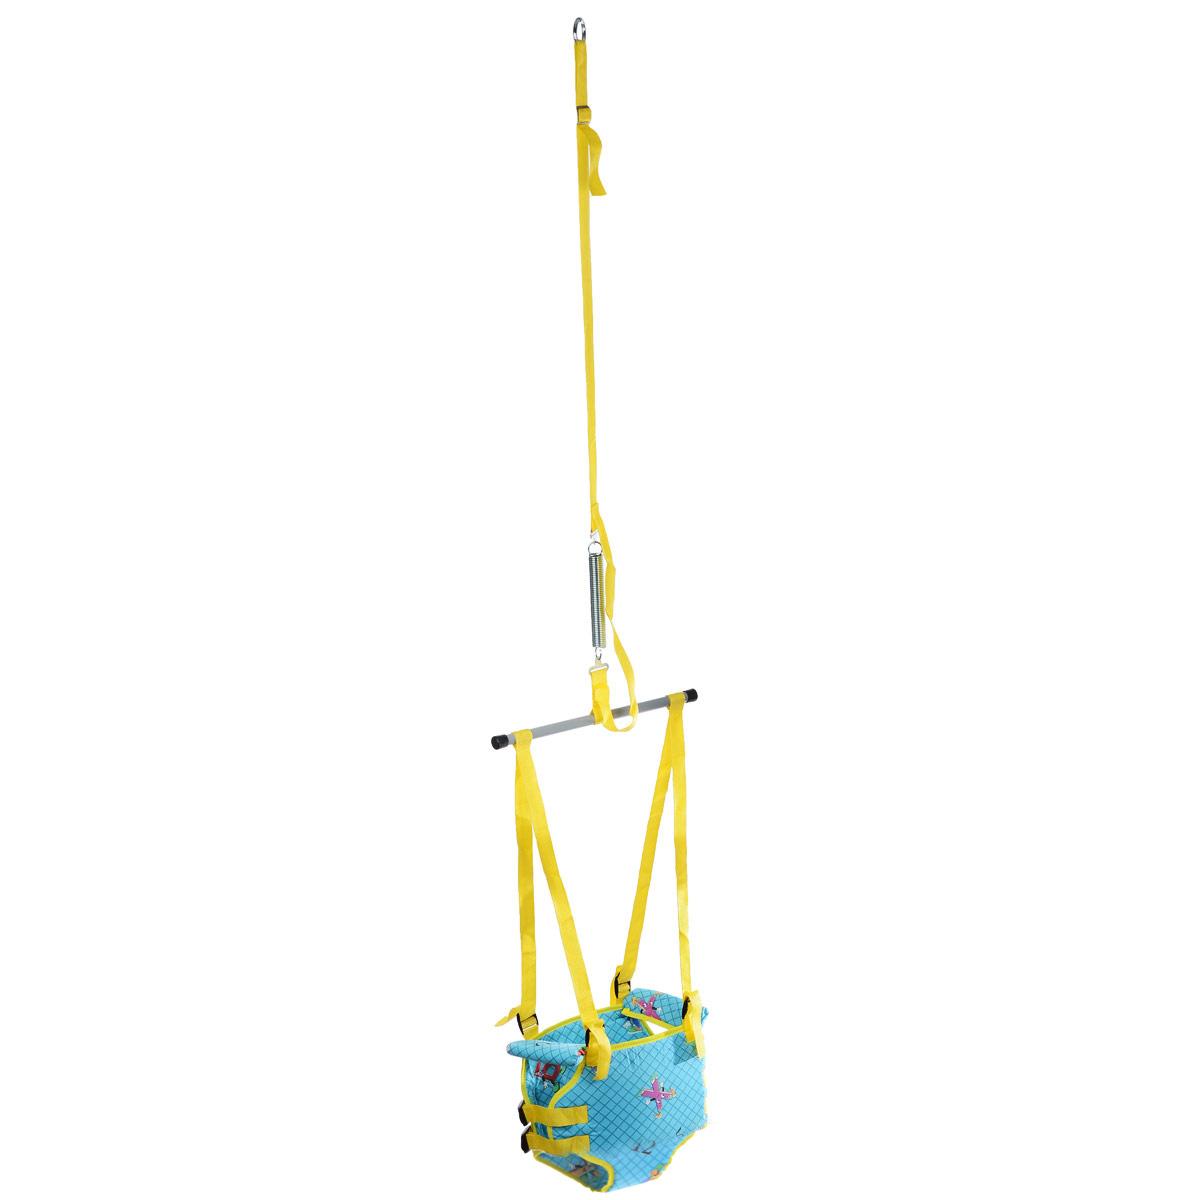 Тренажер Фея  Прыгунки 2 в 1 , цвет: голубой, желтый -  Ходунки, прыгунки, качалки